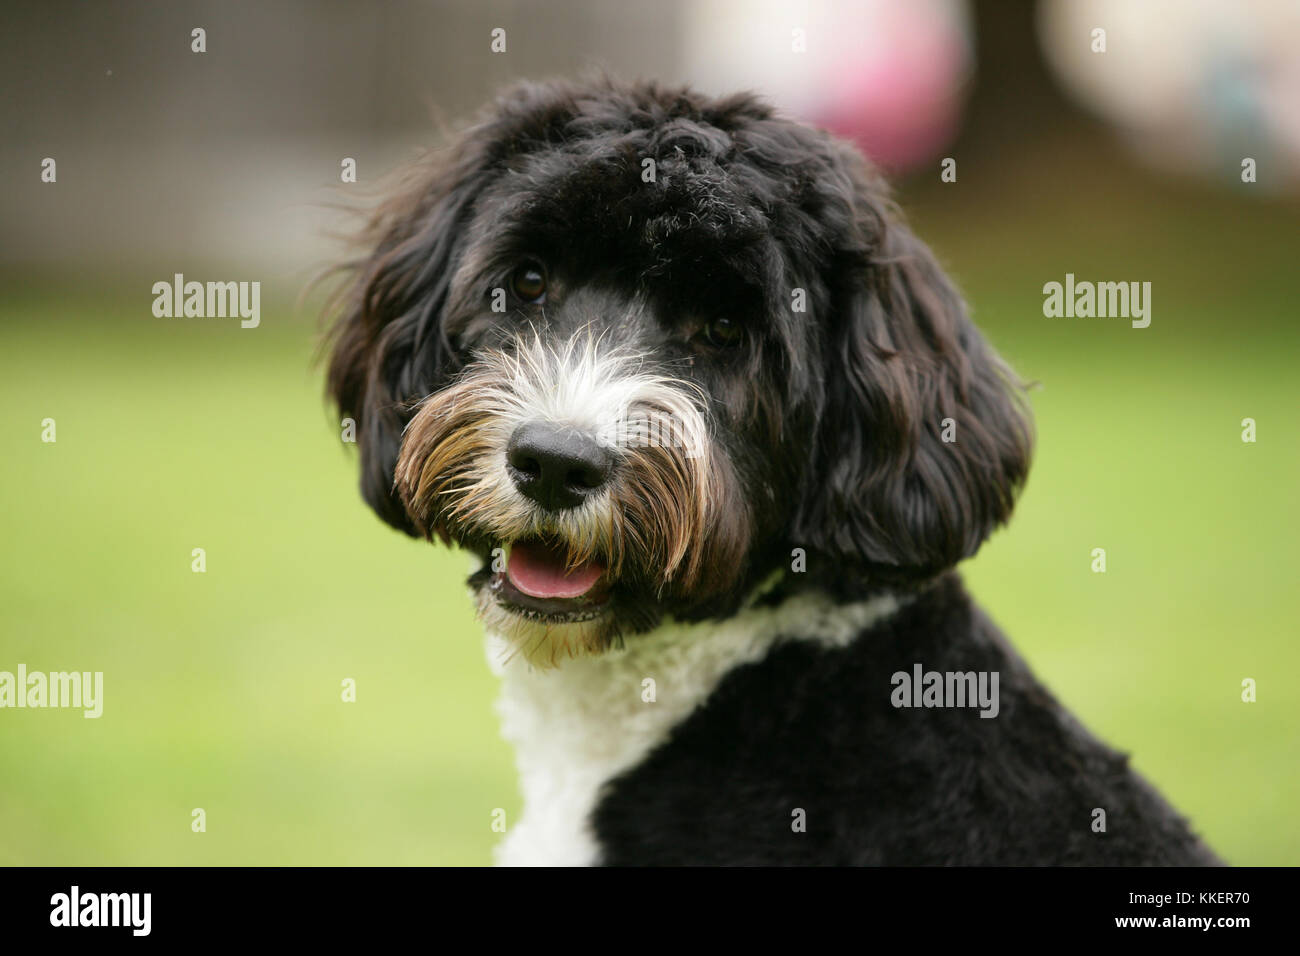 Portuguese Water Dog Cão de Agua Panting - Stock Image